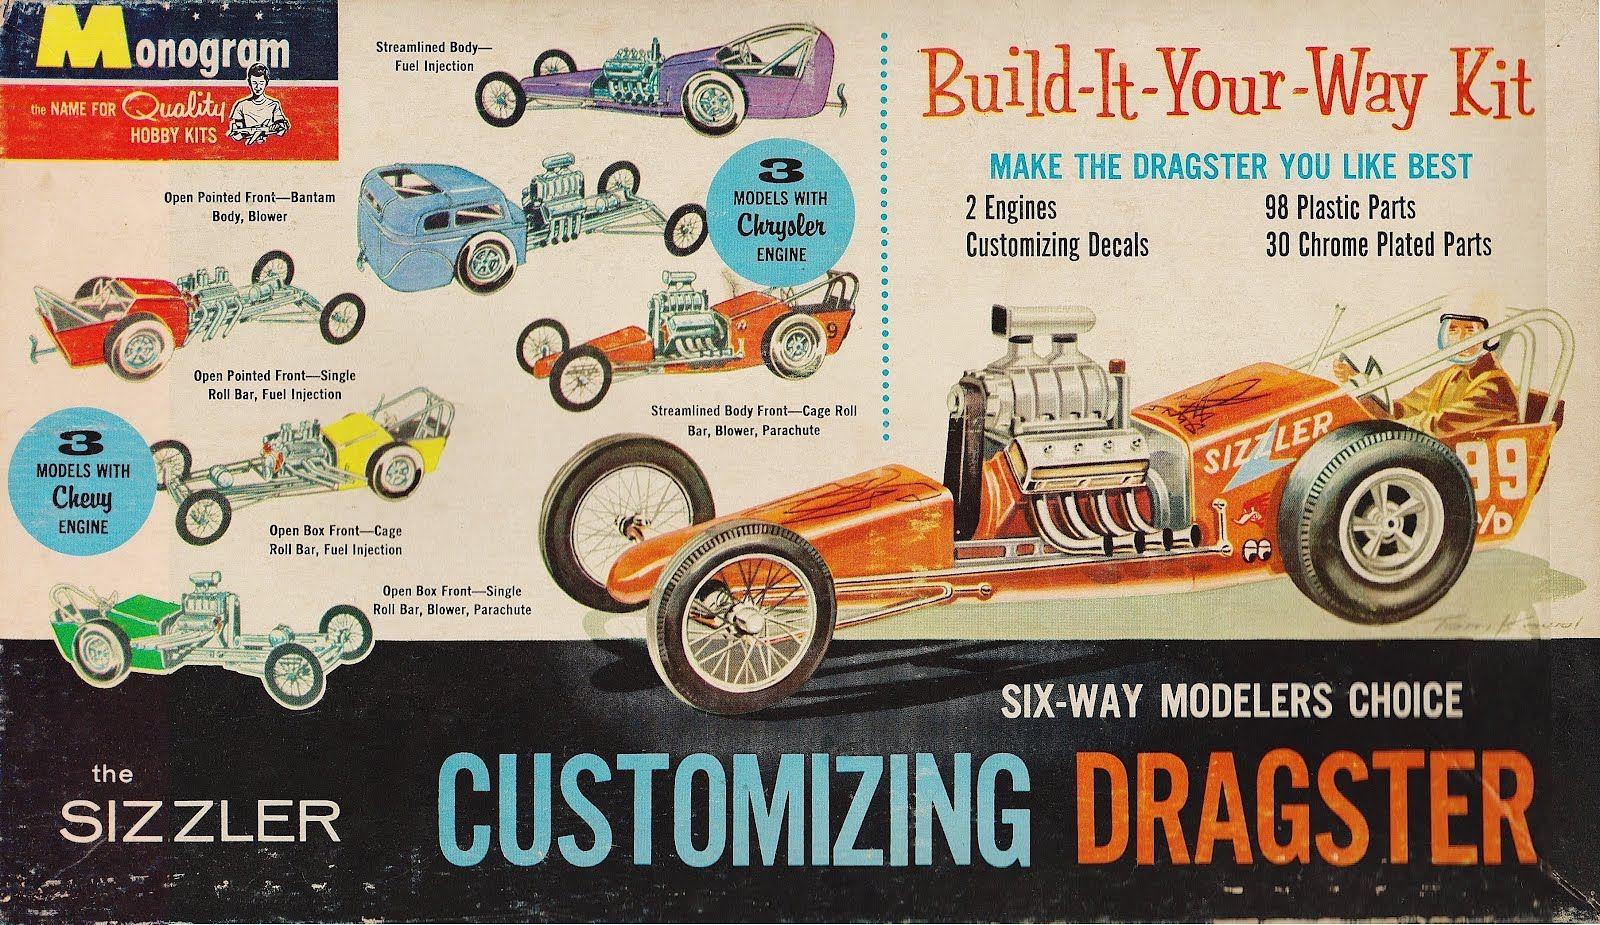 Monogram - Customizing Dragster. Great Box Art!